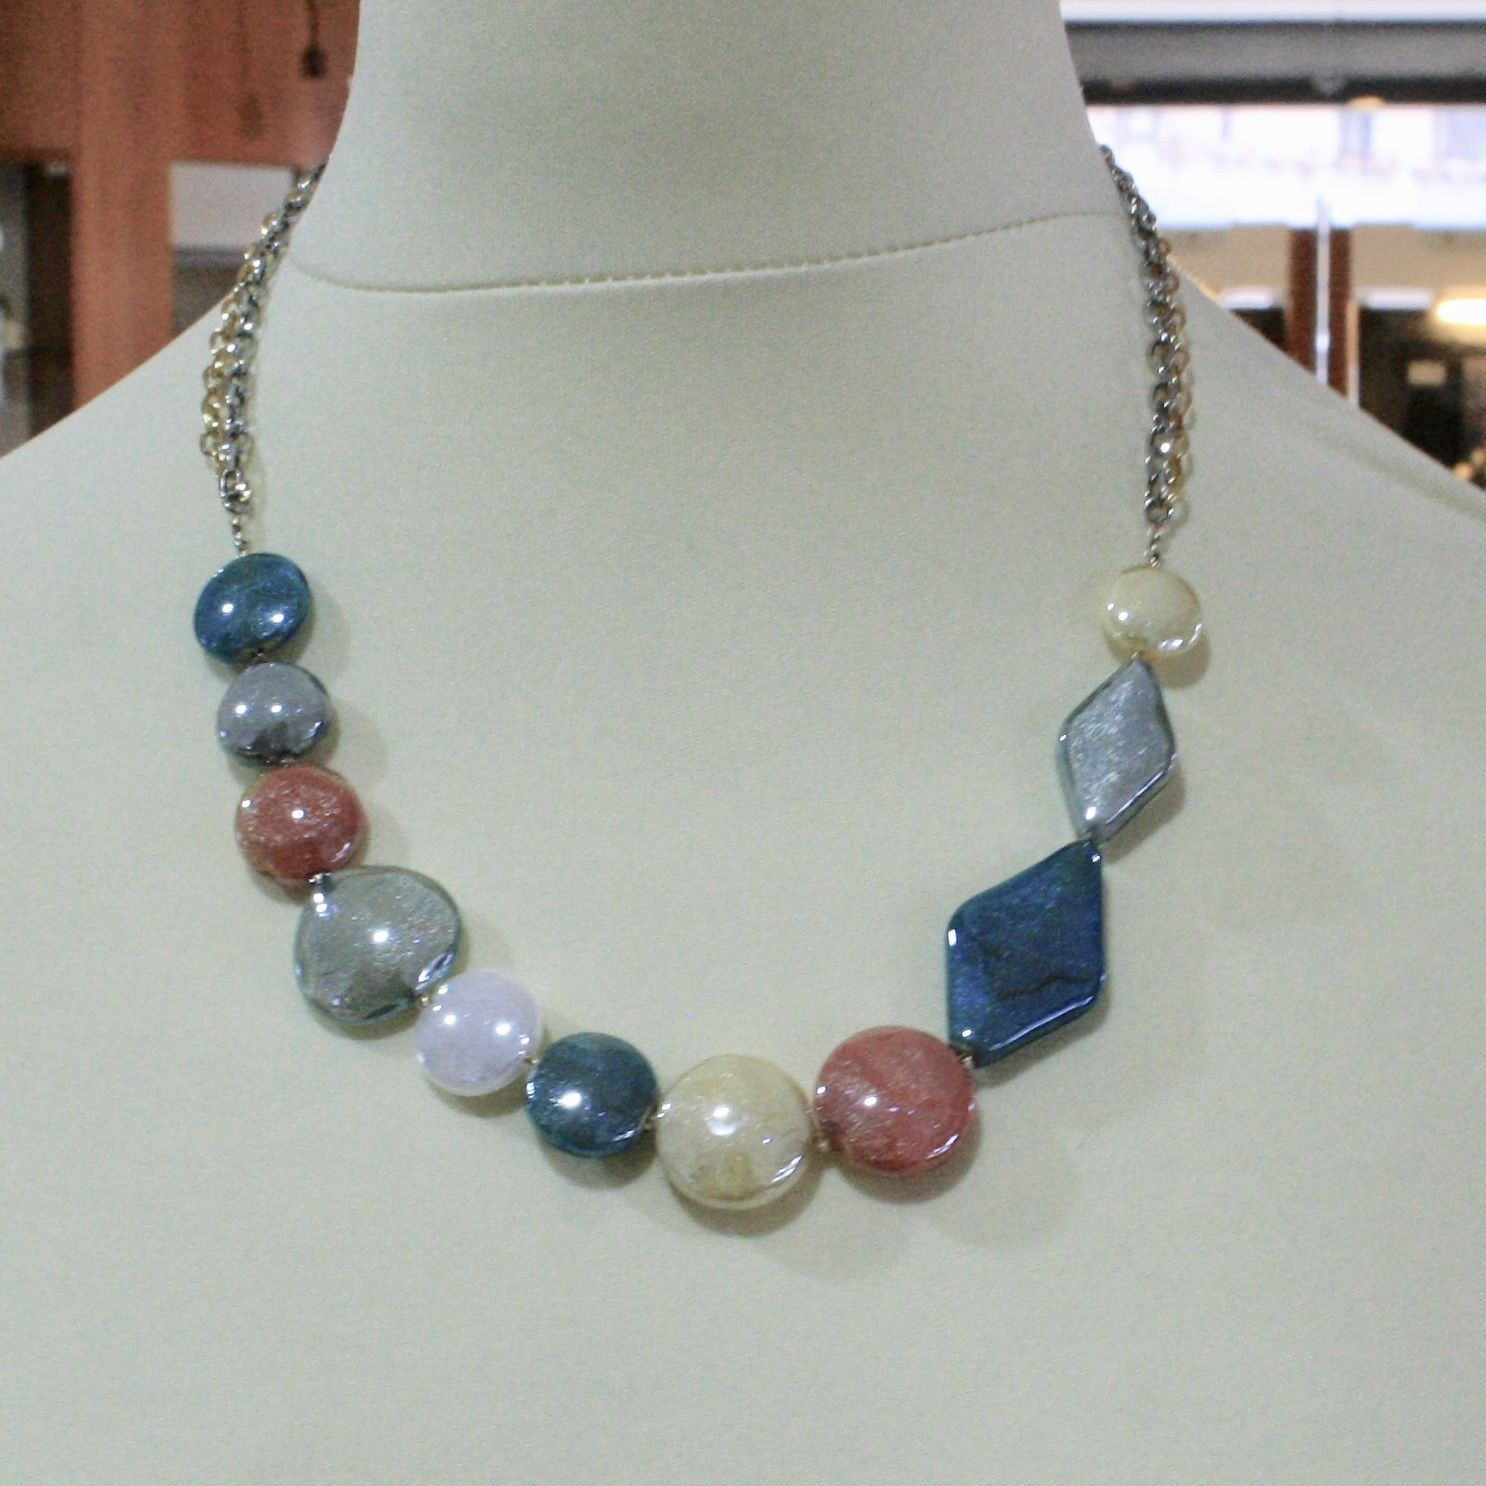 ANTICA MURRINA VENEZIA NECKLACE WITH MURANO GLASS YELLOW ORANGE BLUE COA86A19